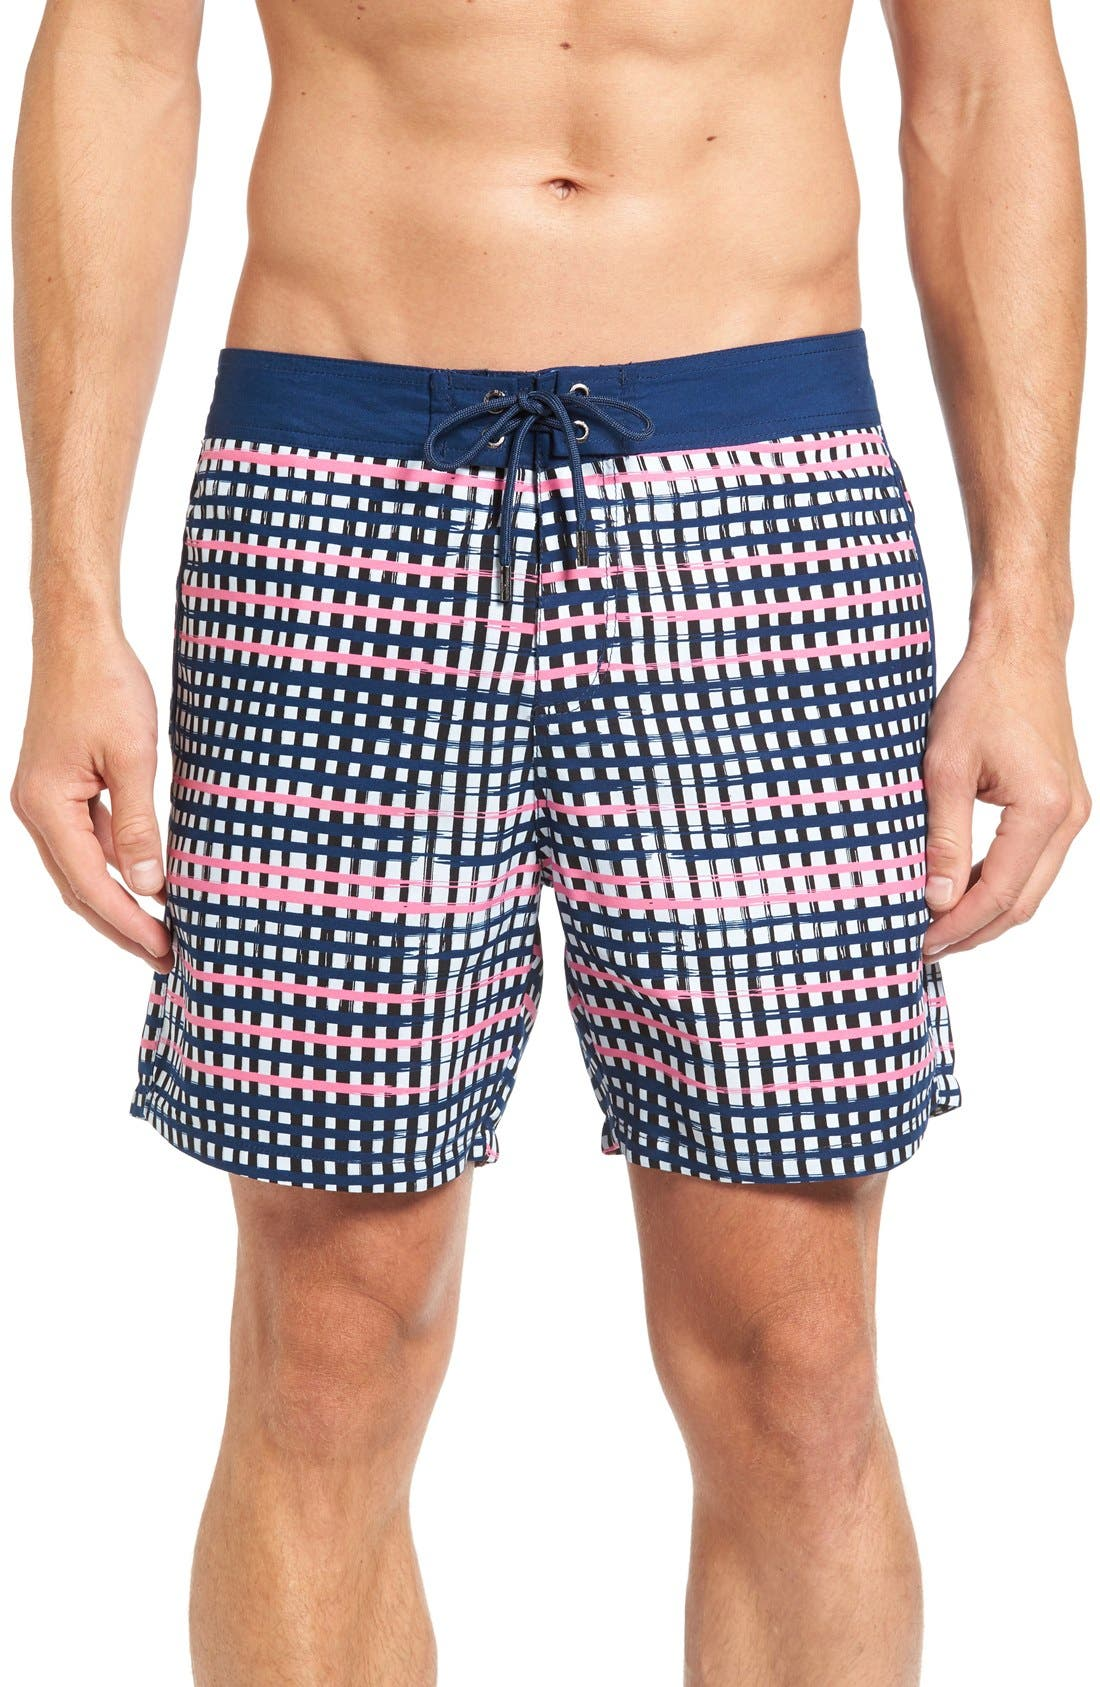 Mr.Swim Plaid Board Shorts